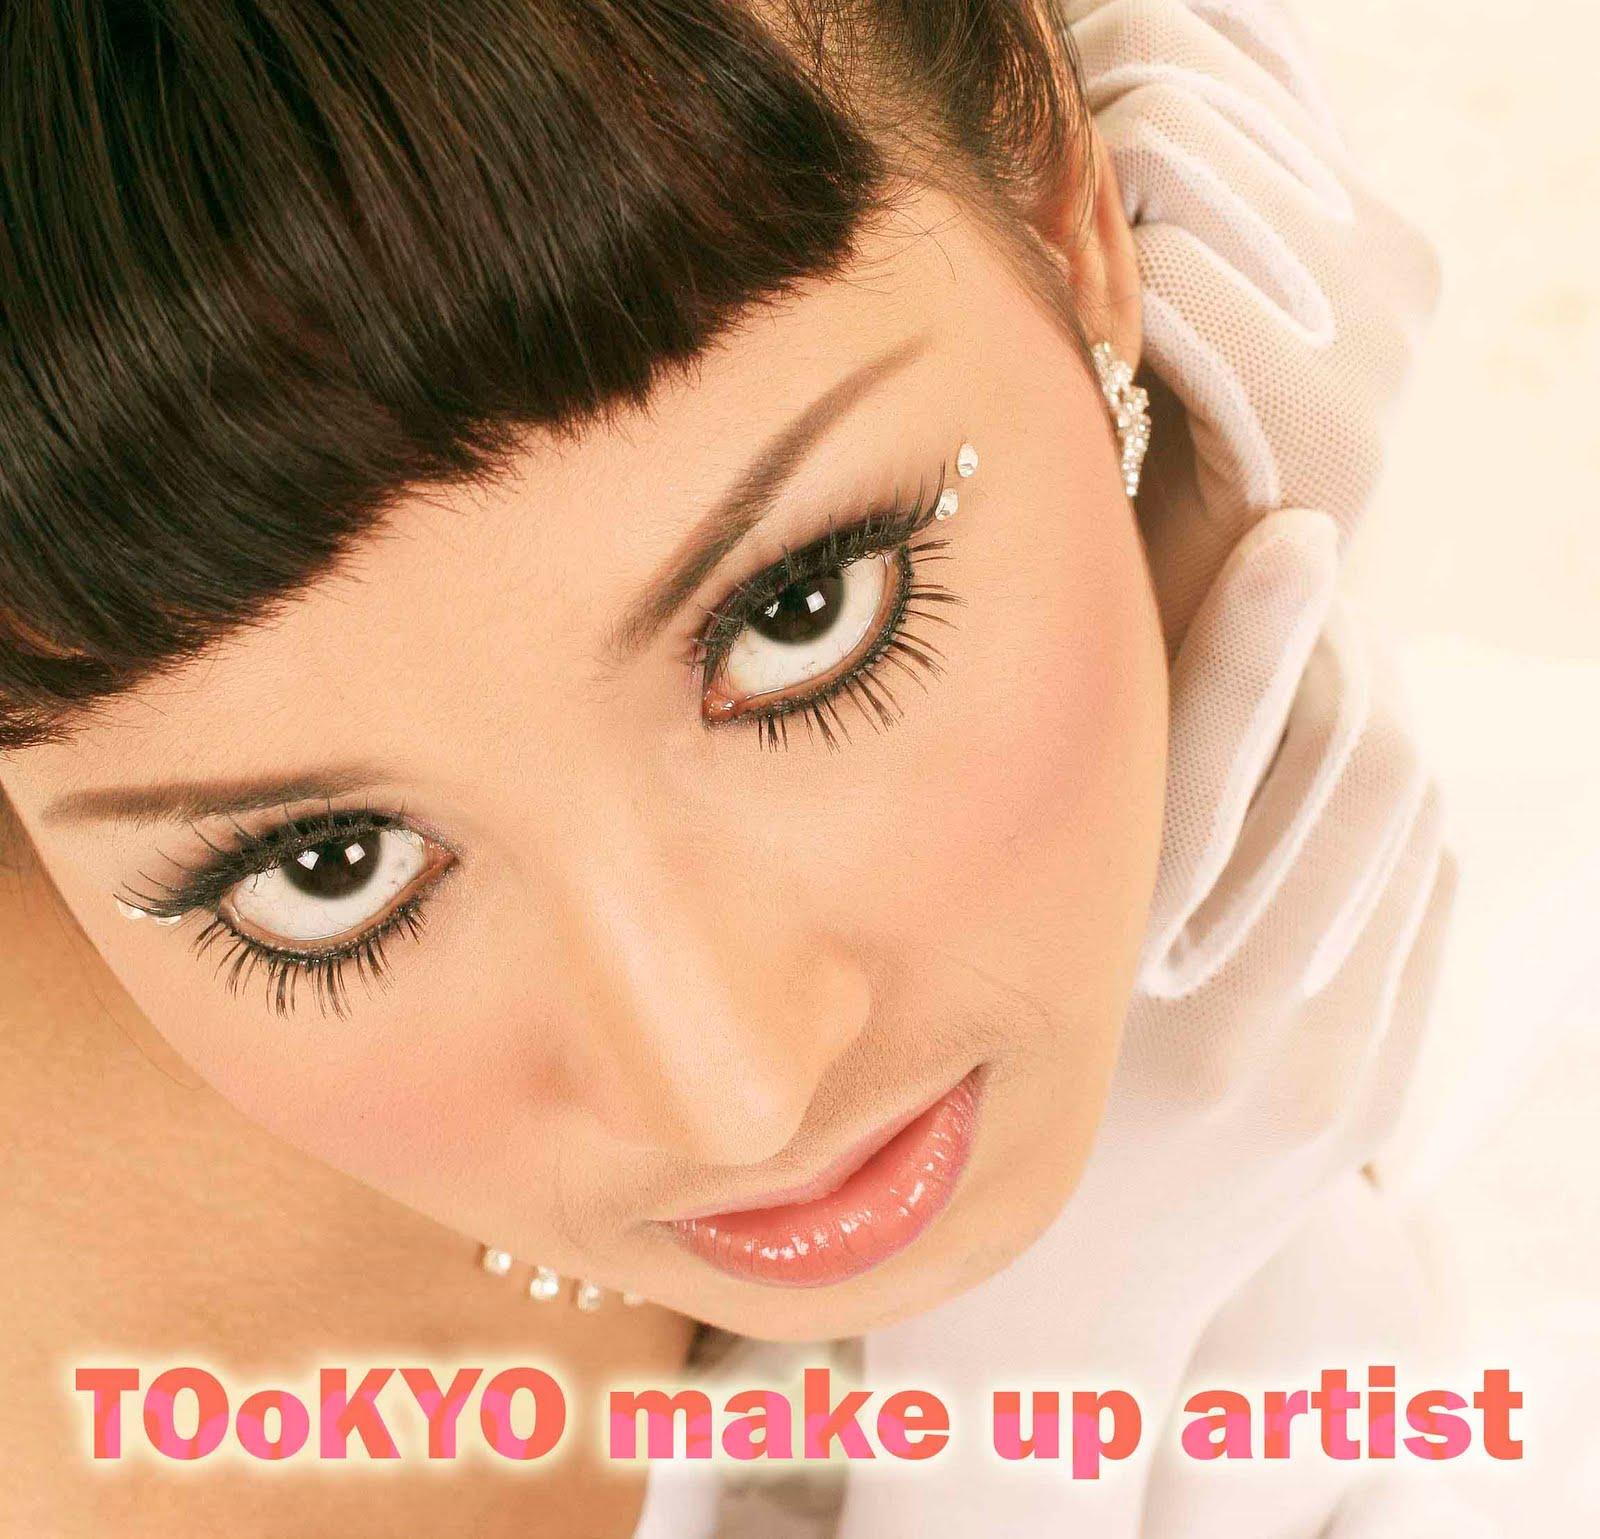 this is my Jobs: TOoKYO make up artist (fariz)